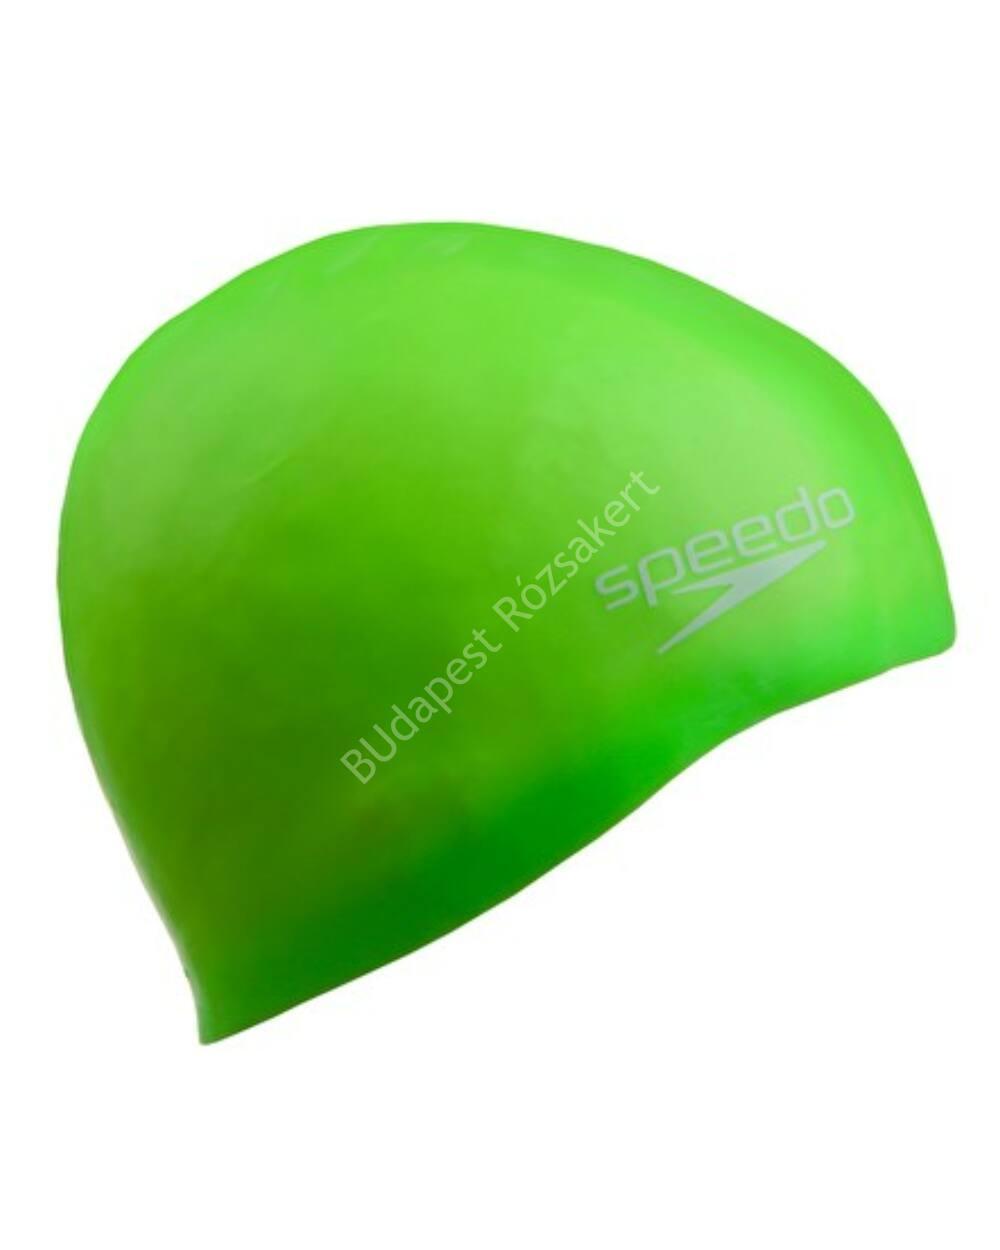 Speedo Junior Plain Moulded Silicone Cap úszósapka, neonzöld